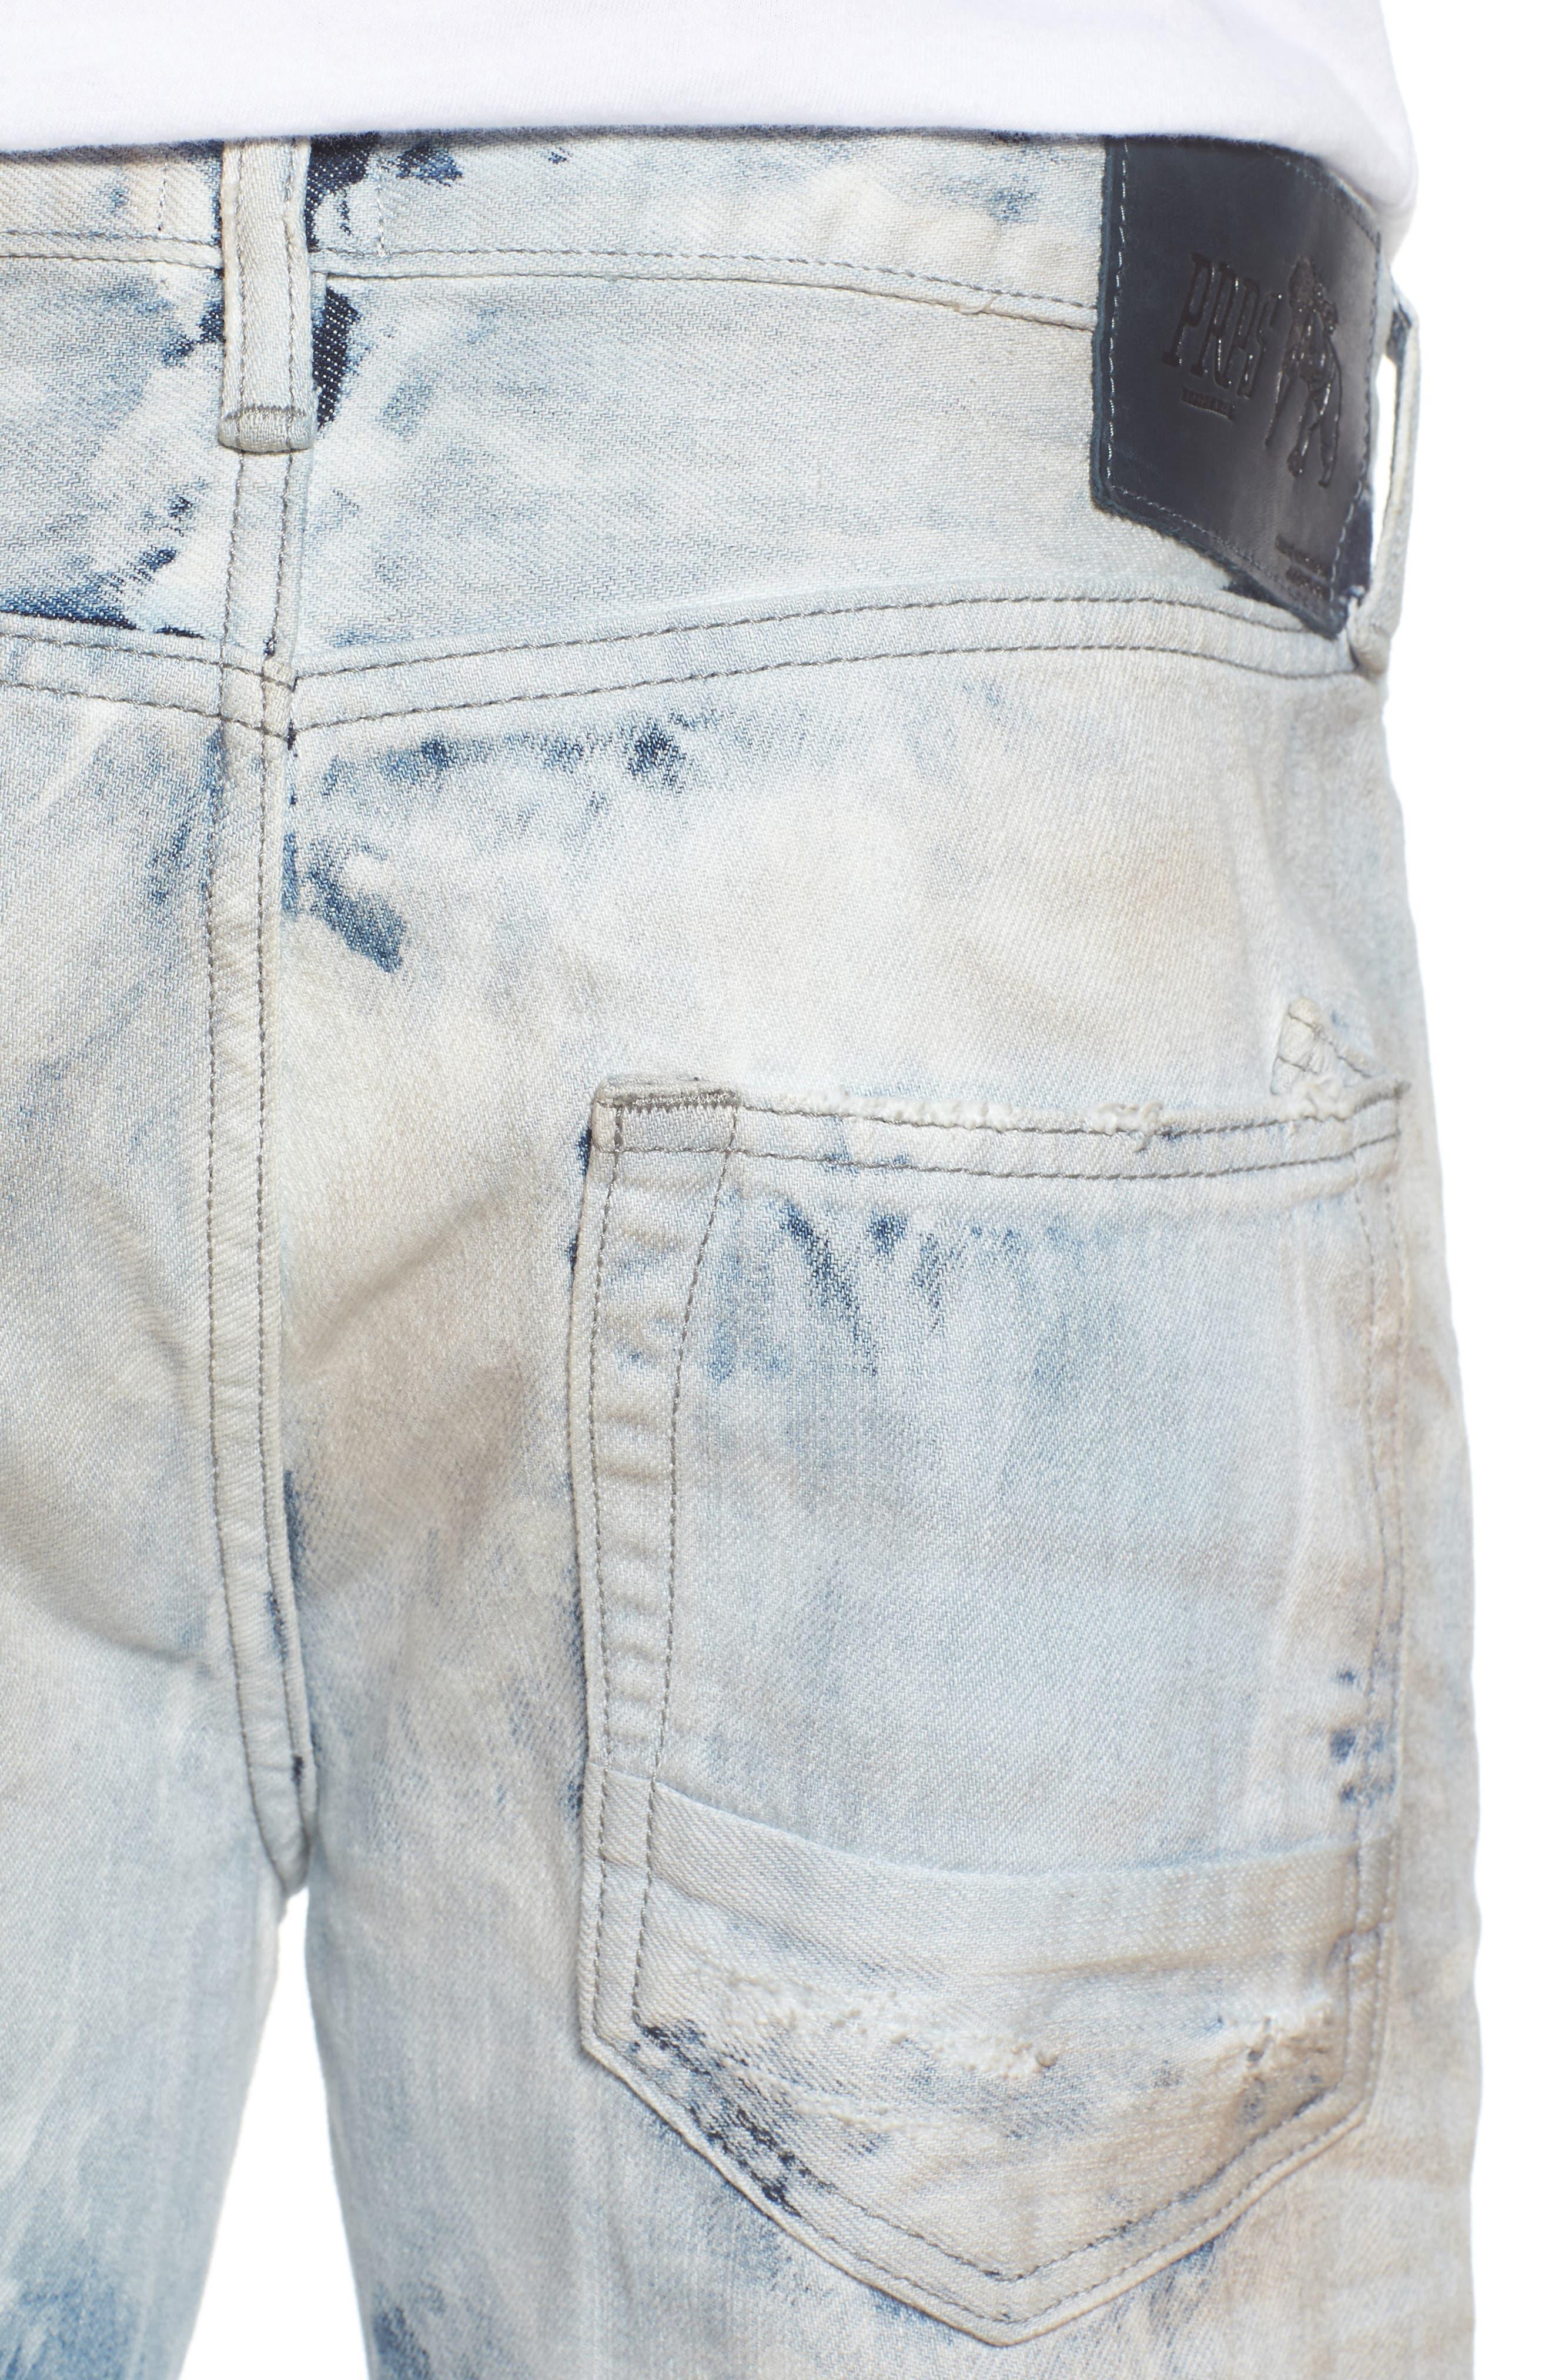 Demon Slim Straight Leg Jeans,                             Alternate thumbnail 4, color,                             COZY LIGHT WASH